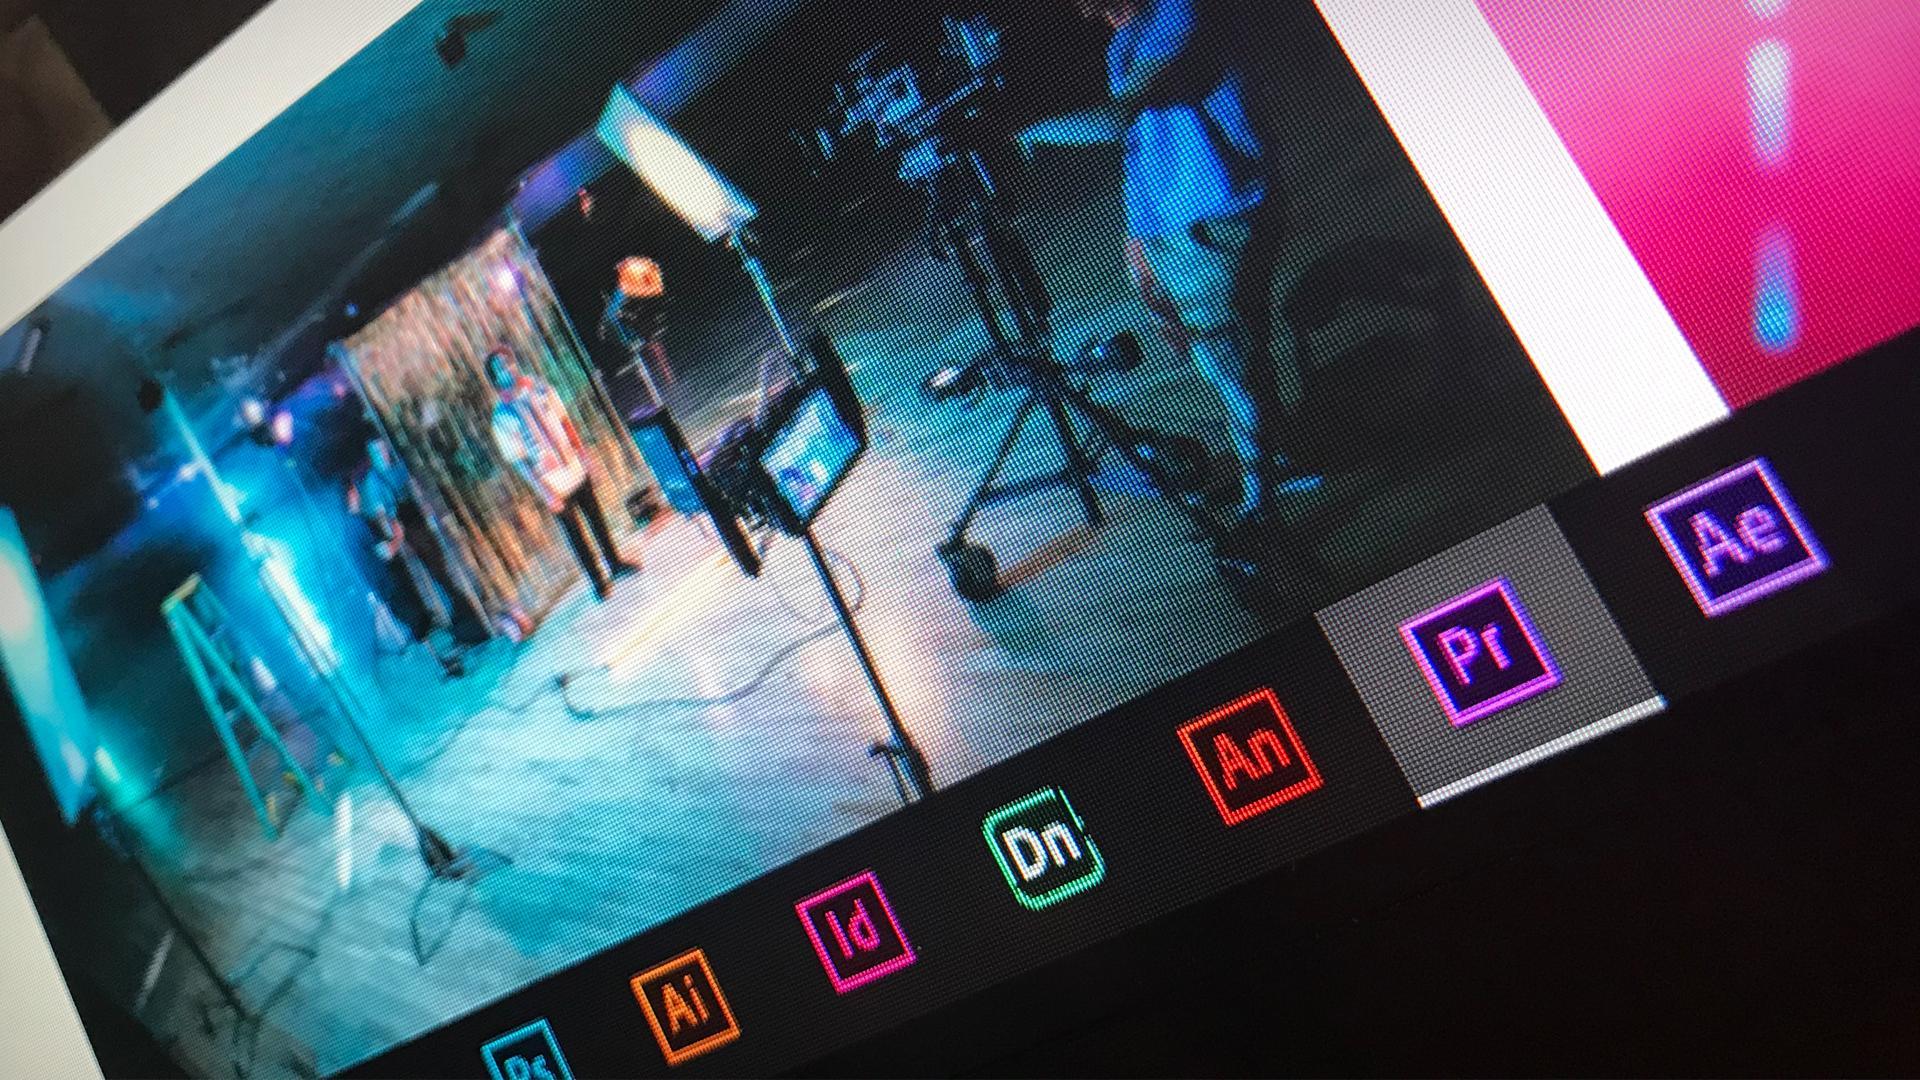 ccll-group-digital-video-editing-v1.jpg